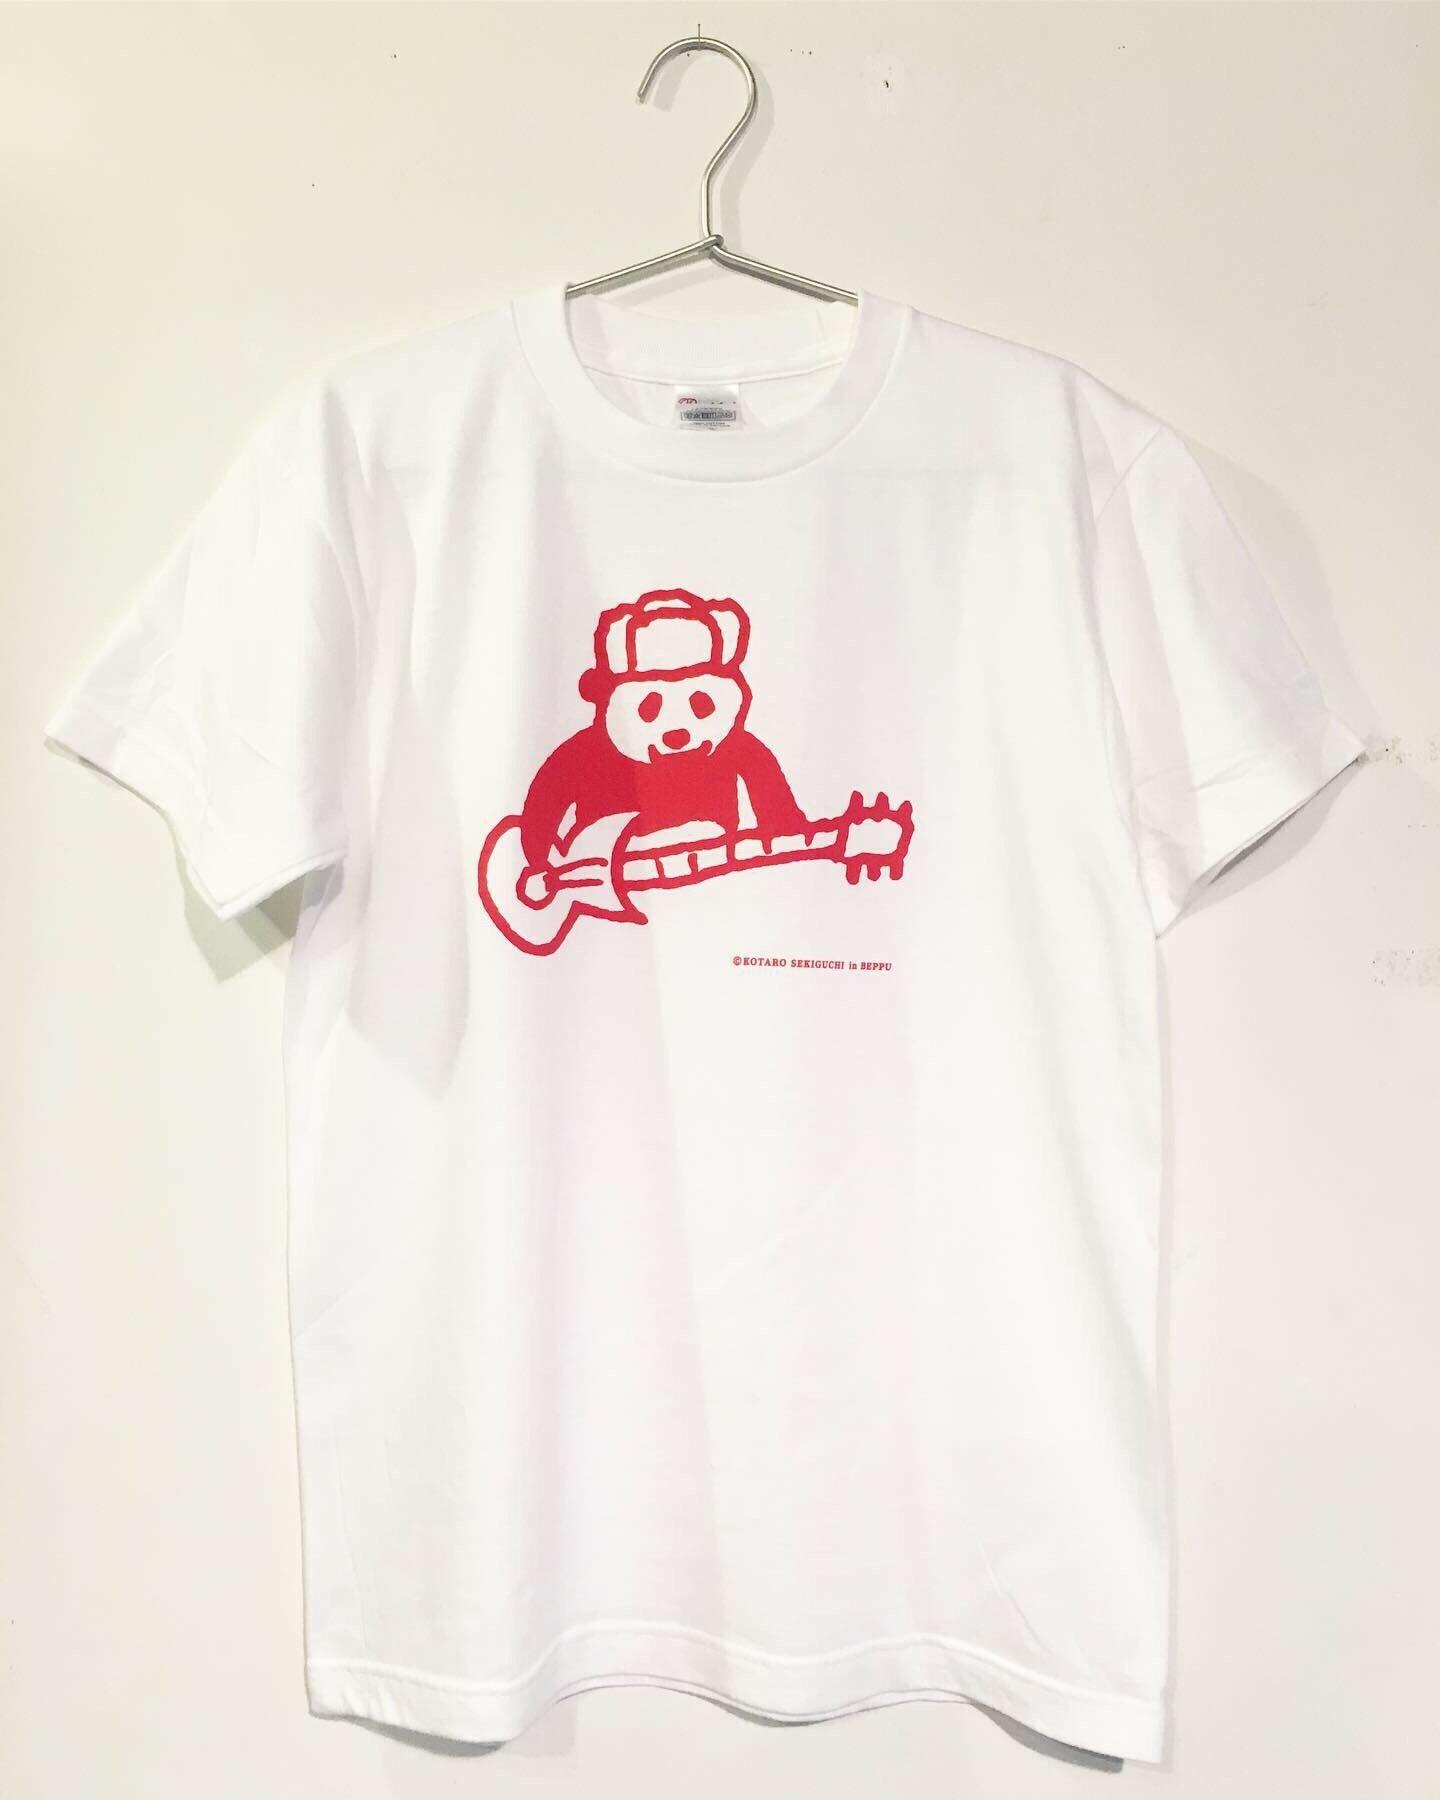 Tシャツ【関口光太郎 in BEPPU】(ユーラシア・パンダ)